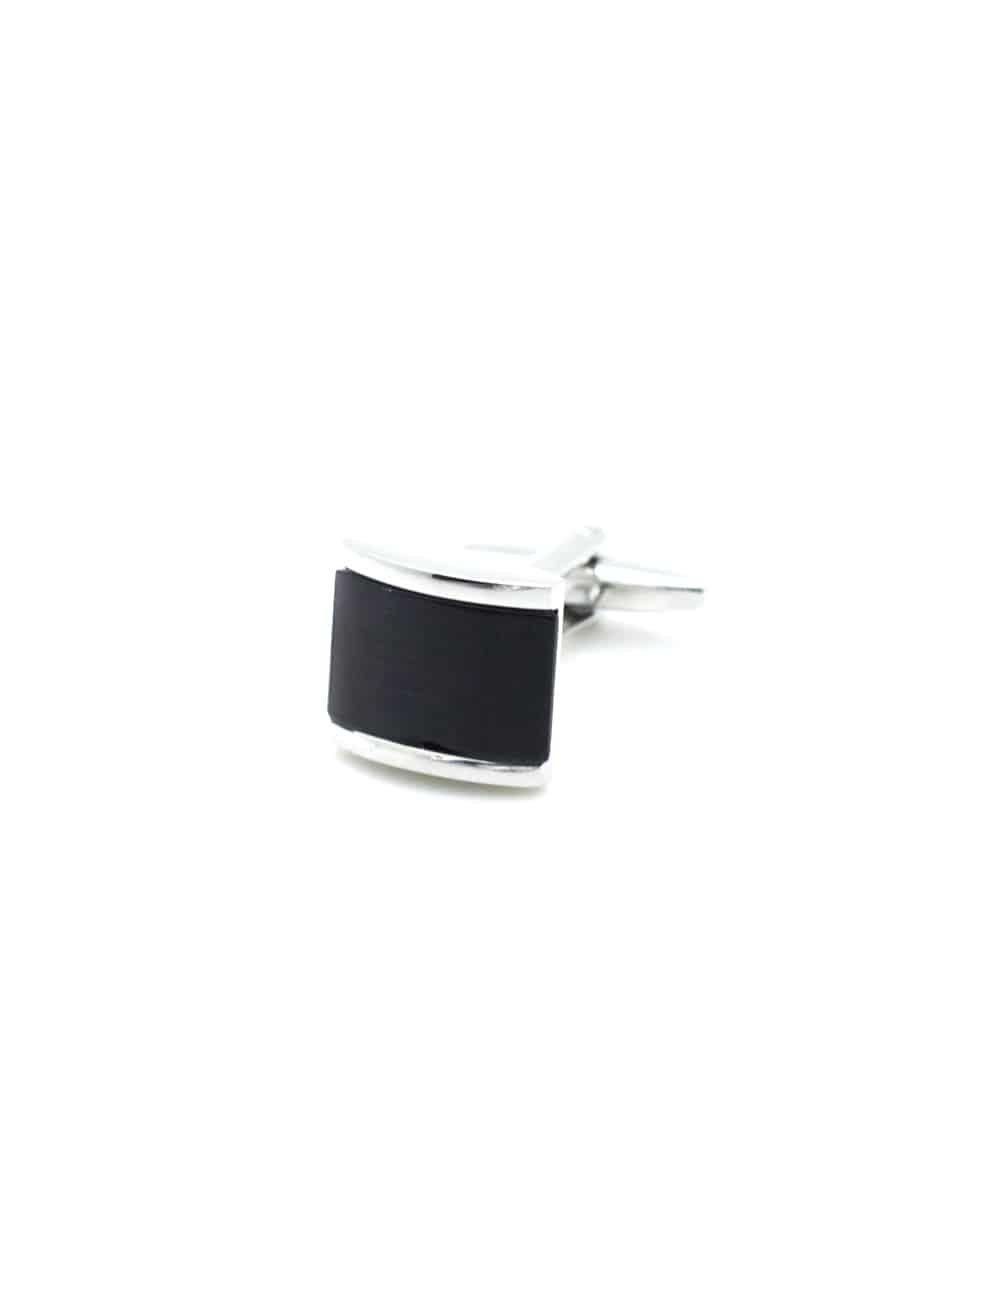 Chrome silver rectangle black enamel panel cufflink 0300-080